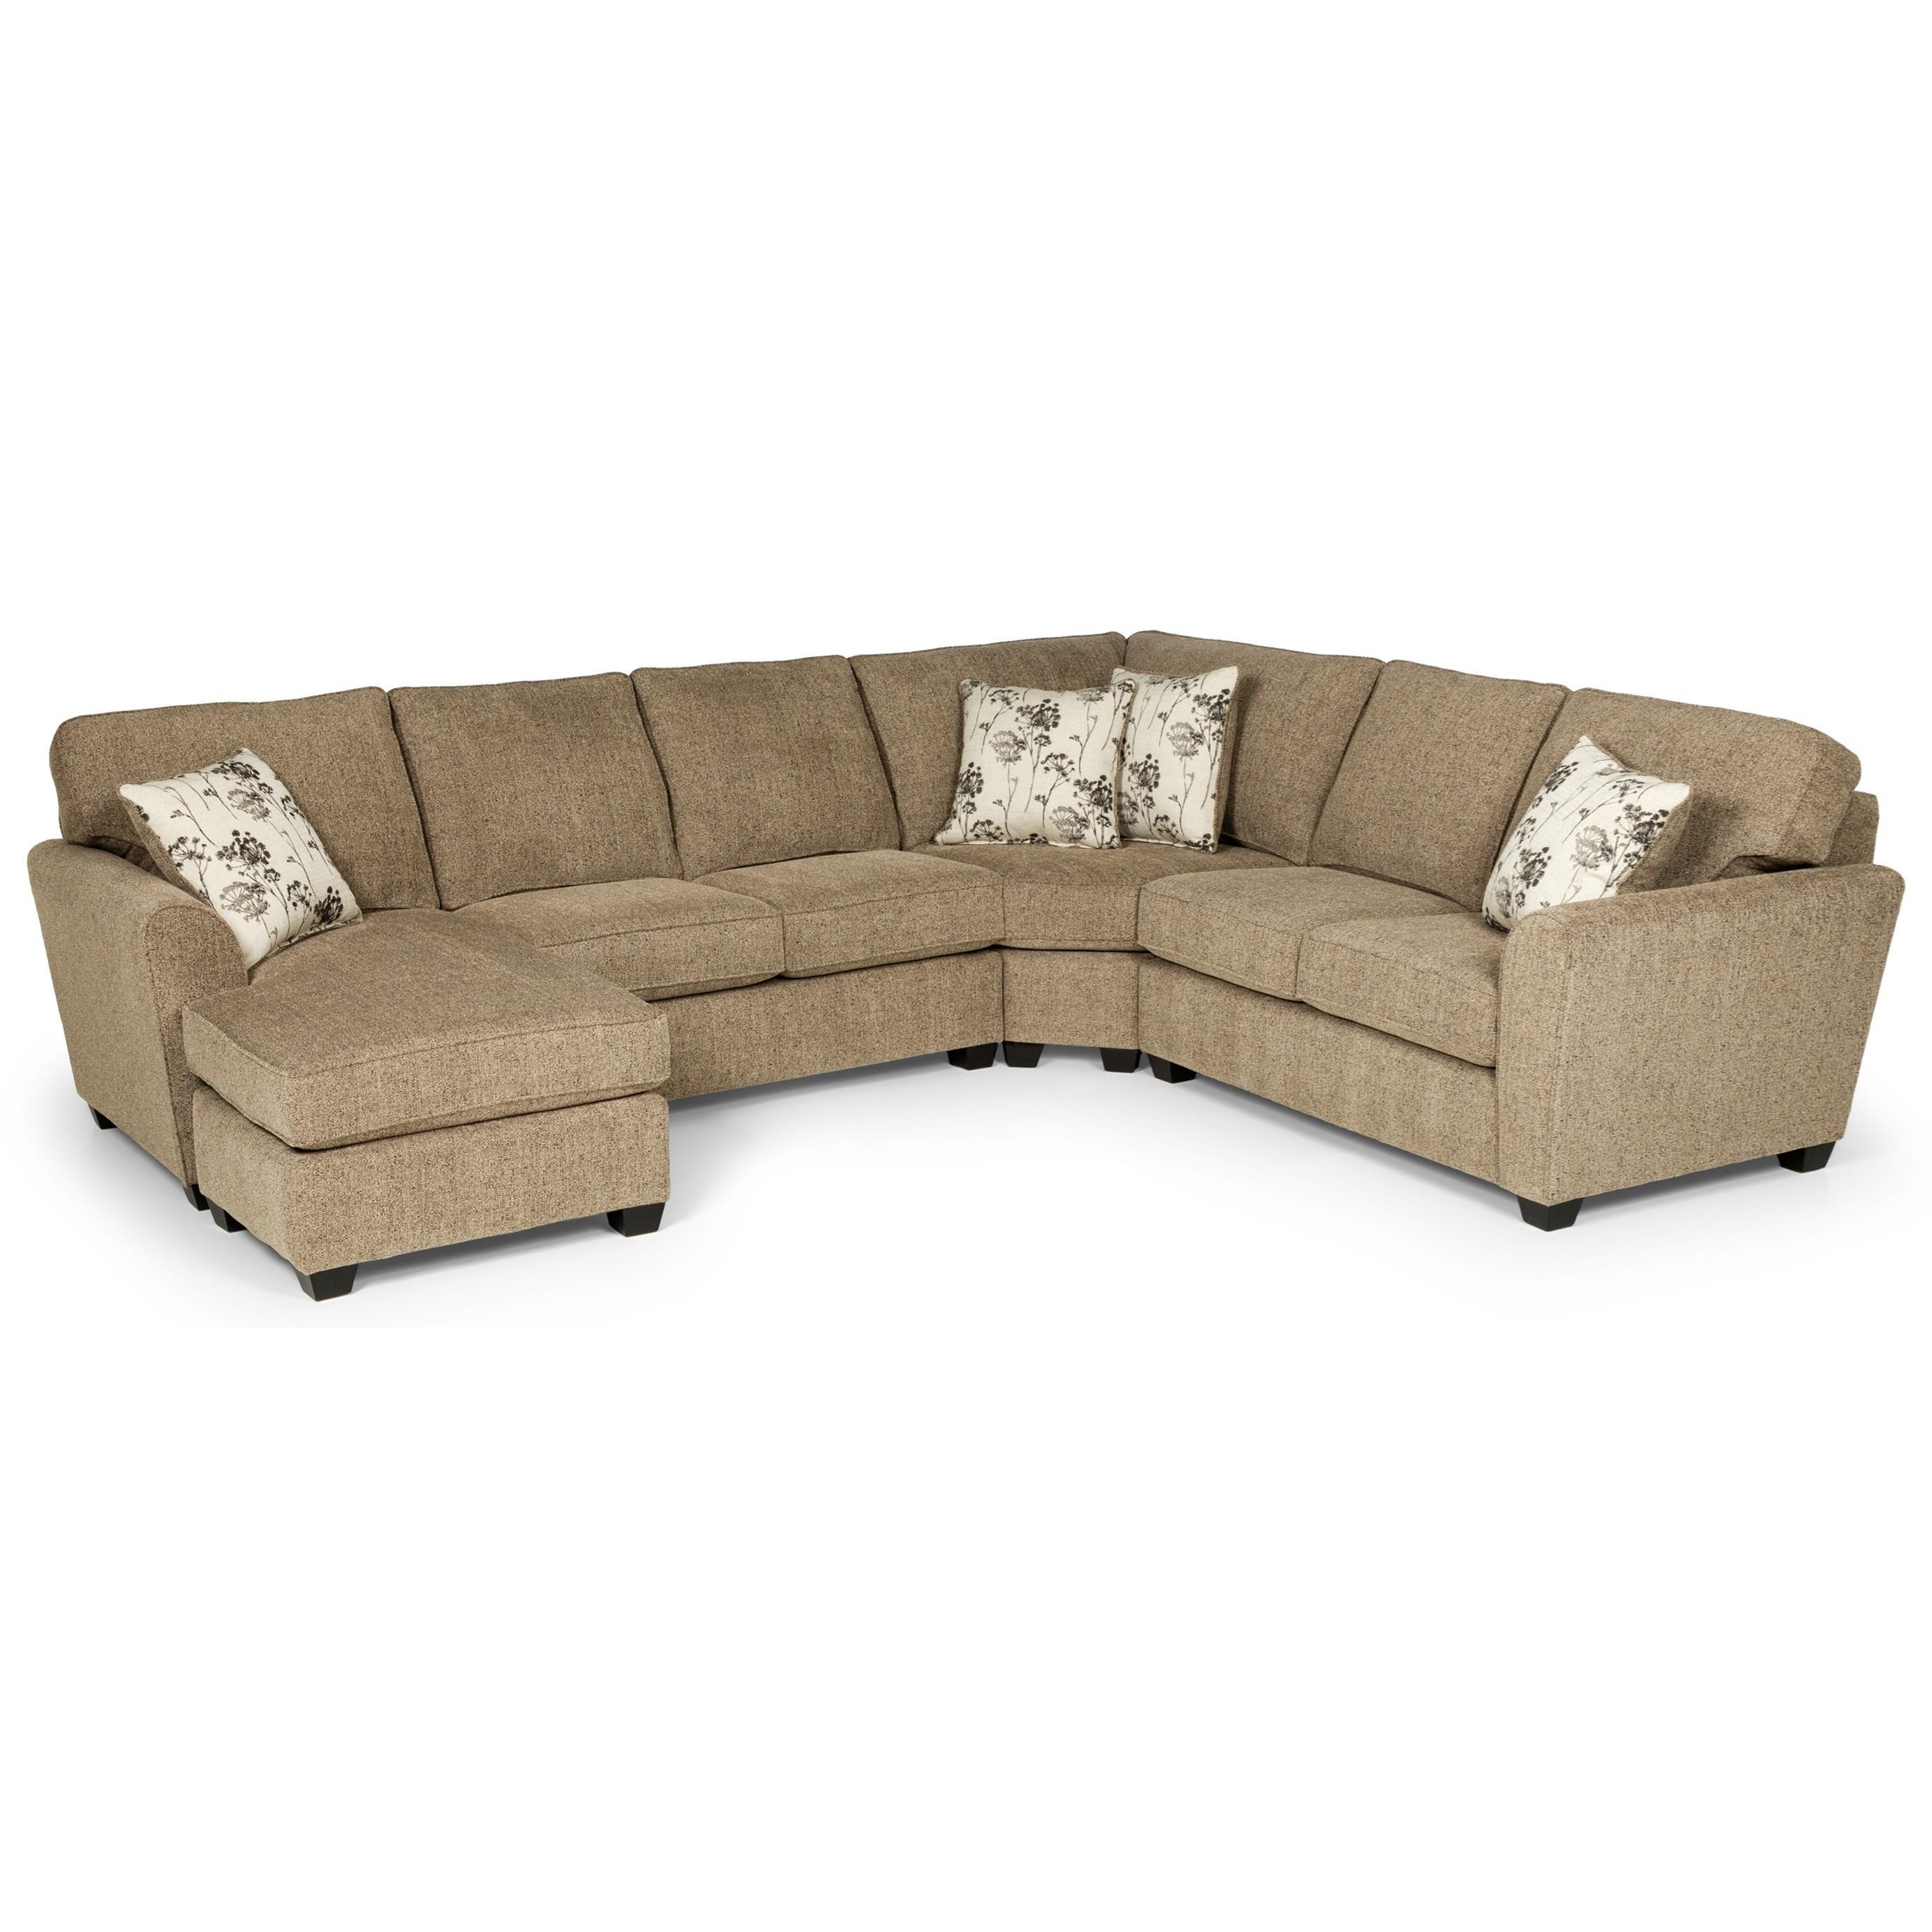 5-Seat Sectional Sofa w/ RAF GelSleeper